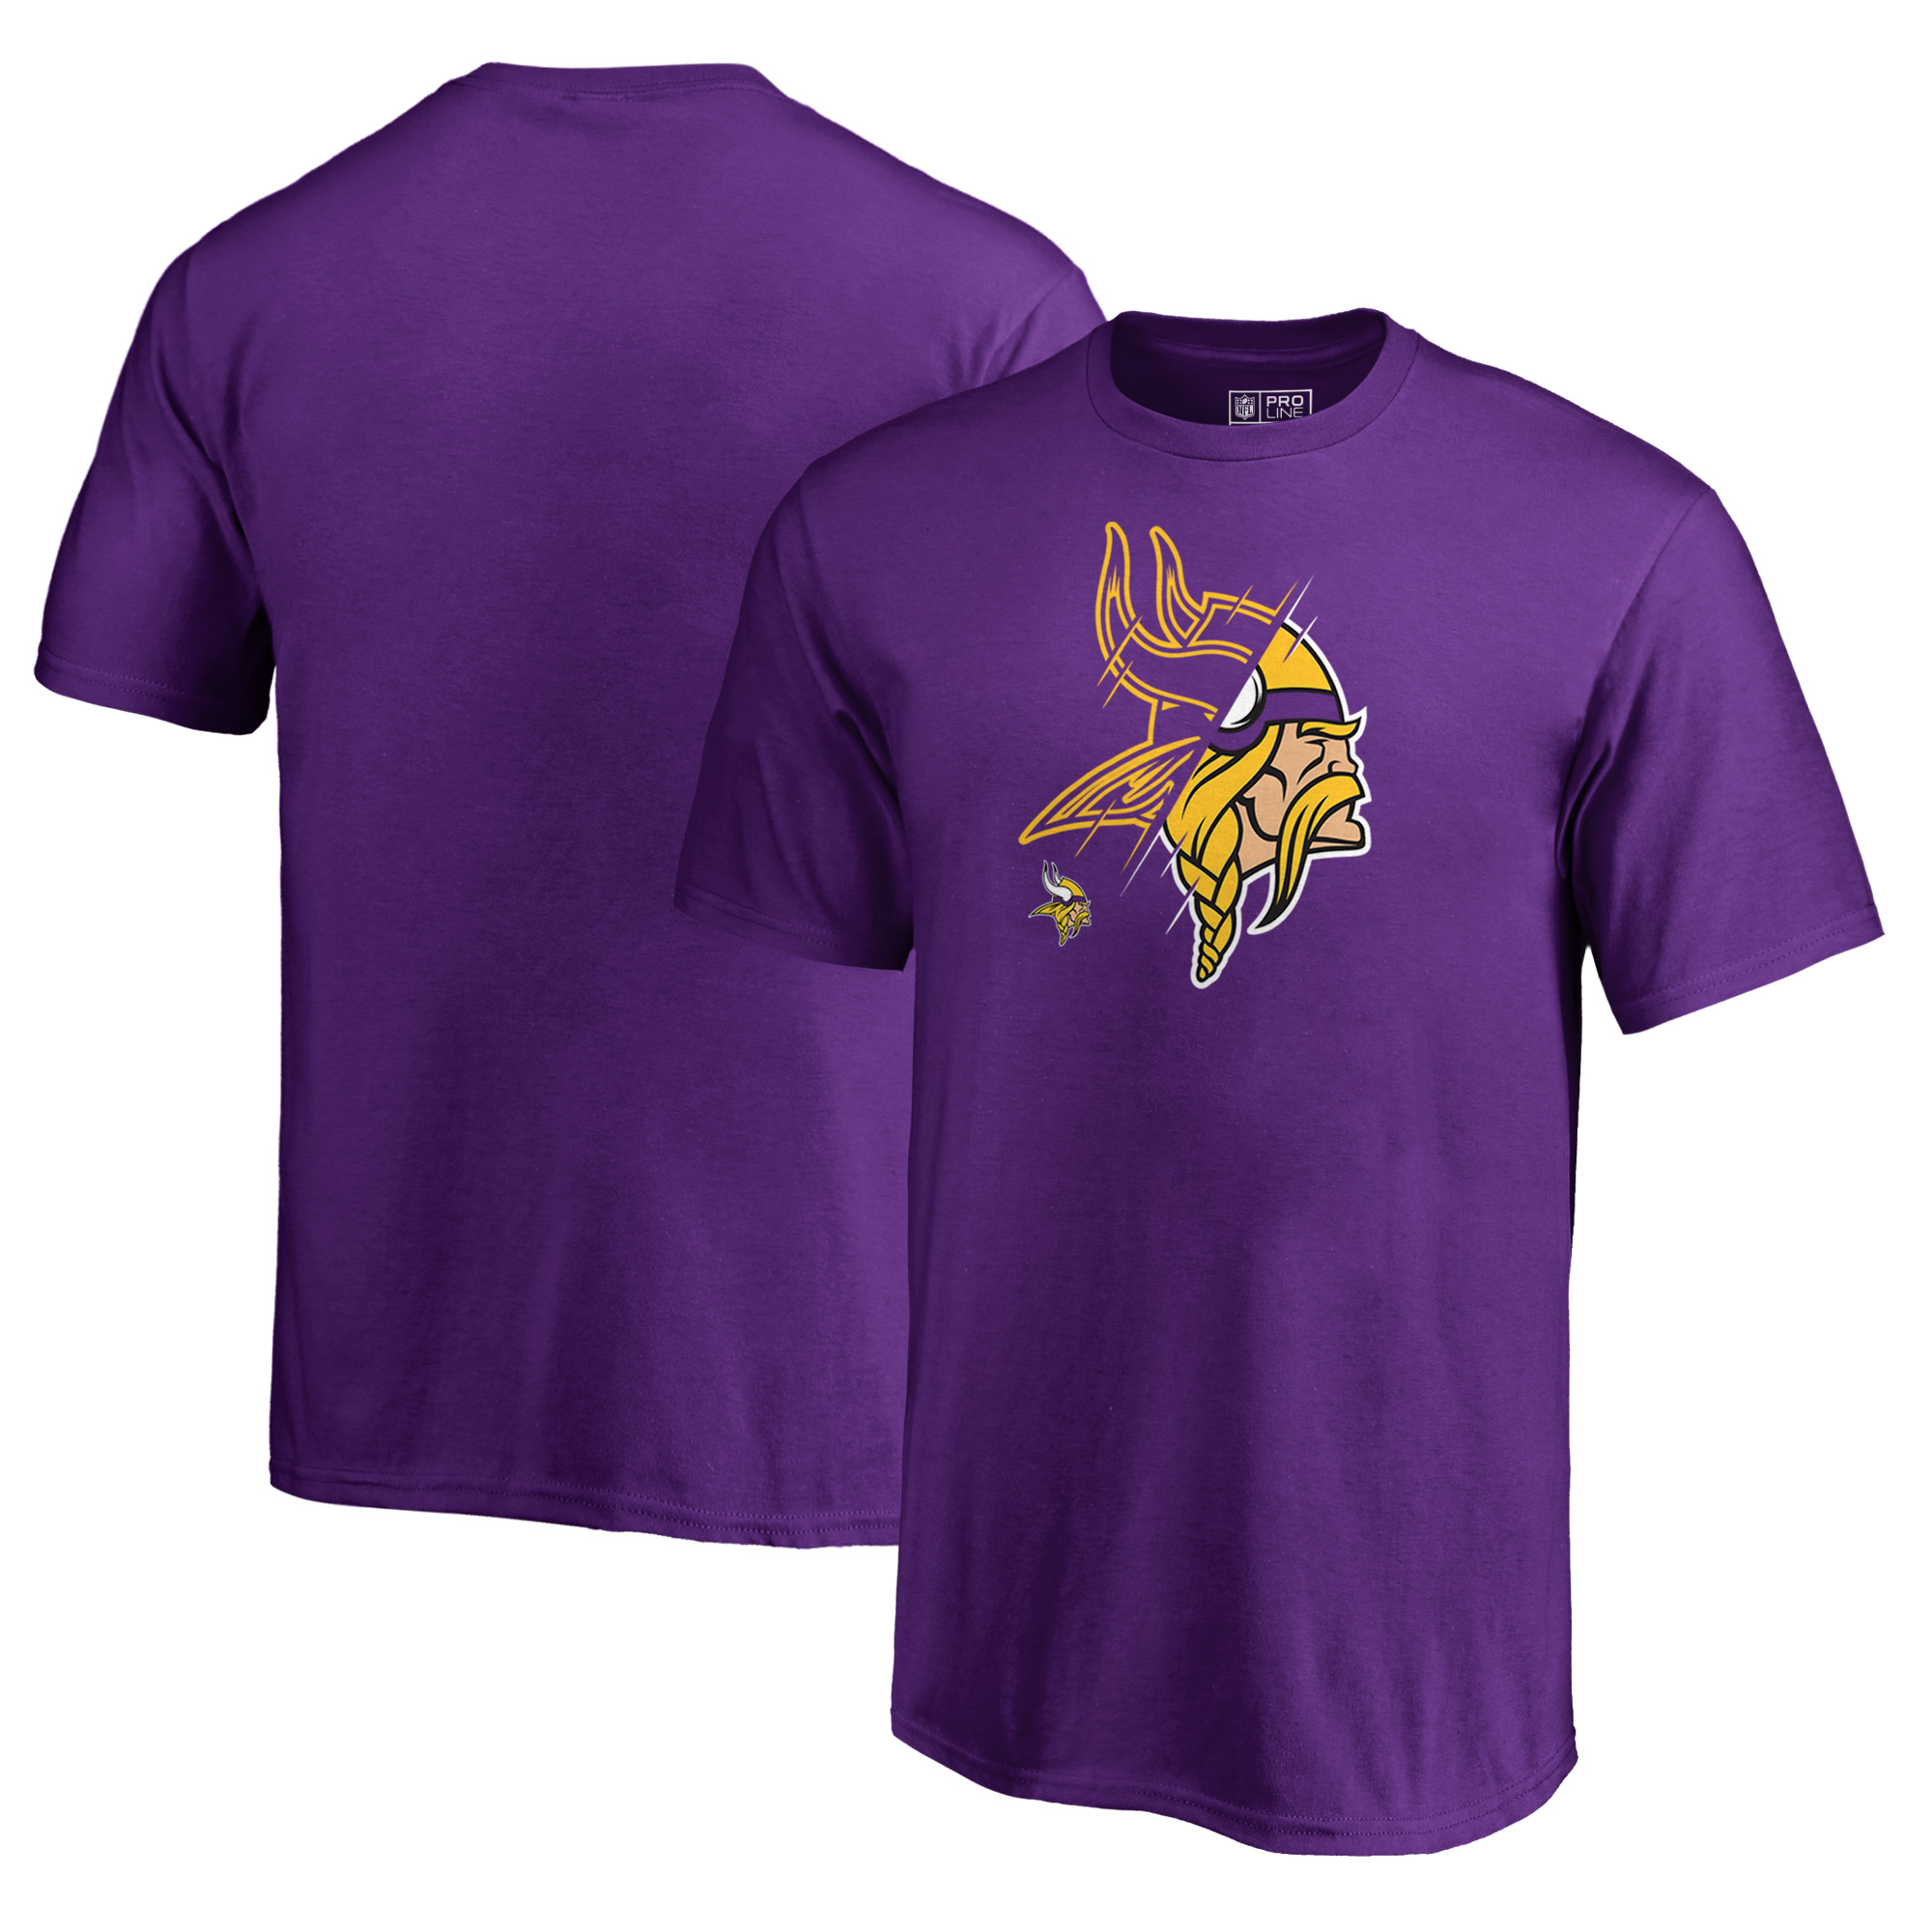 Minnesota Vikings NFL Pro Line by Fanatics Branded Youth X-Ray T-Shirt - Purple